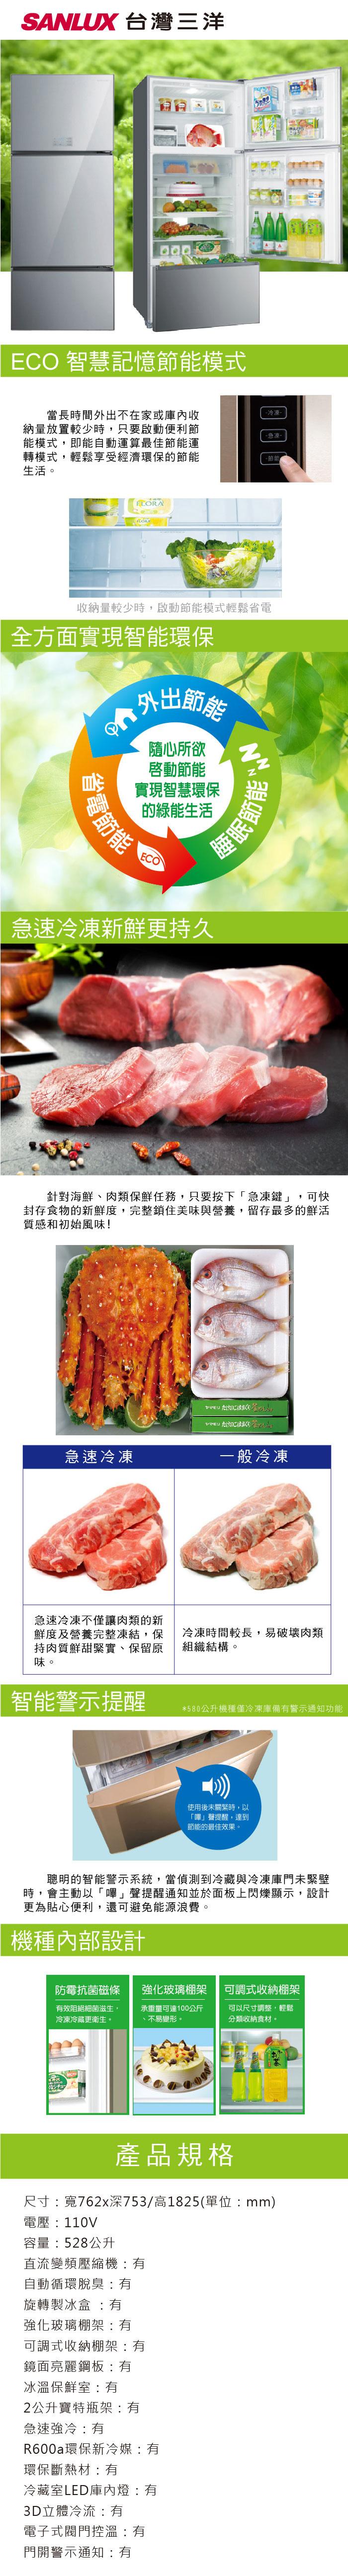 SANLUX 台灣三洋 SR-C528CVG 冰箱 528L 自動循環脫臭 冰溫保鮮室 急速冷凍